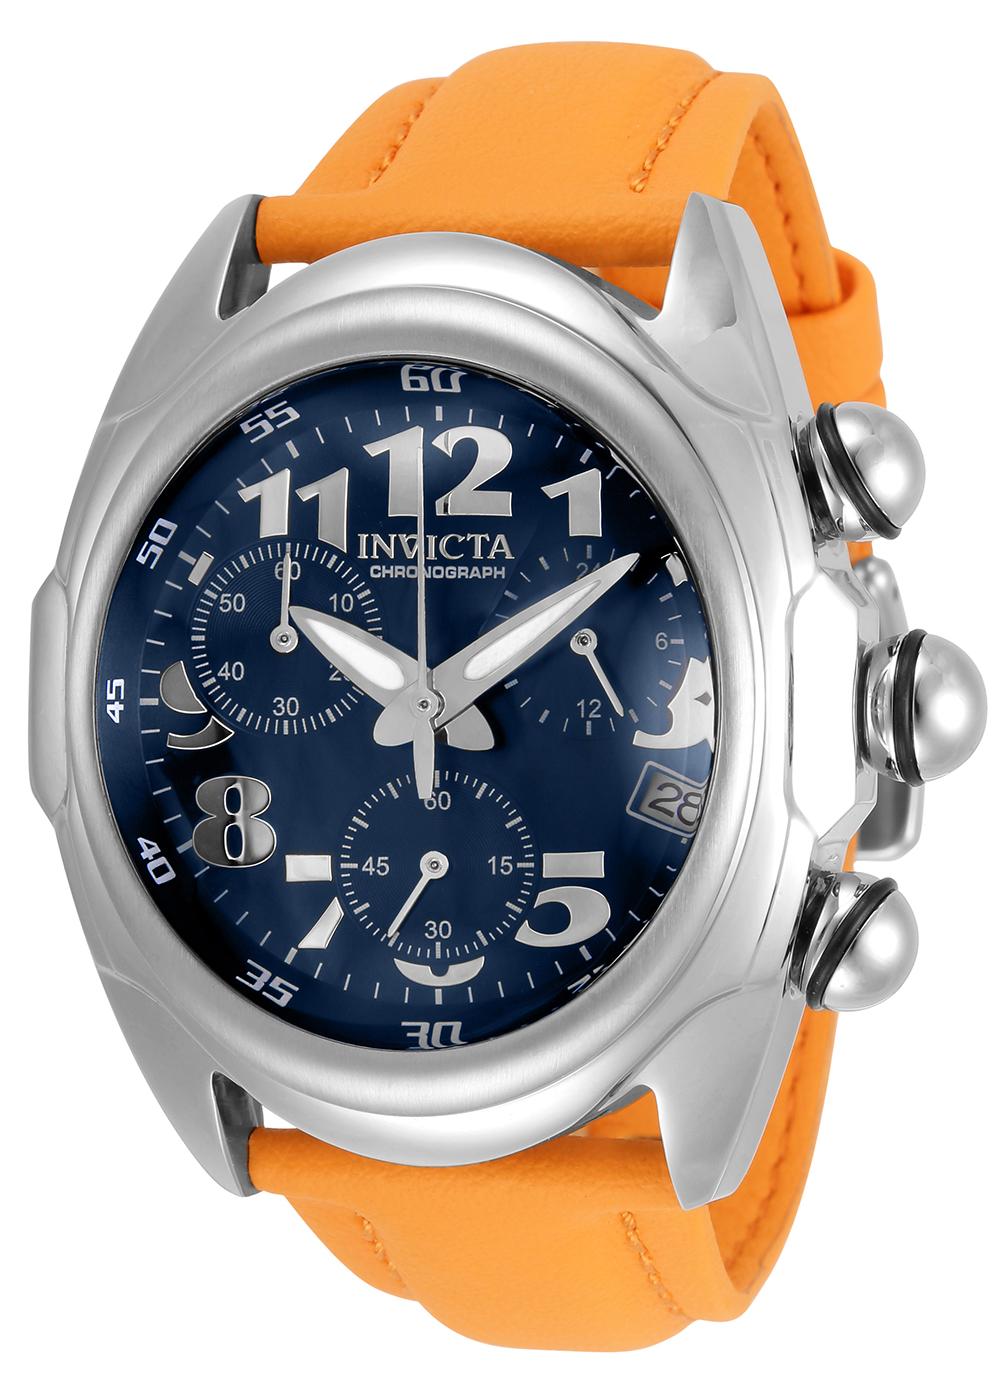 Invicta Lupah Quartz Mens Watch - 46mm Stainless Steel Case, Polyurethane Band, Orange (31406)